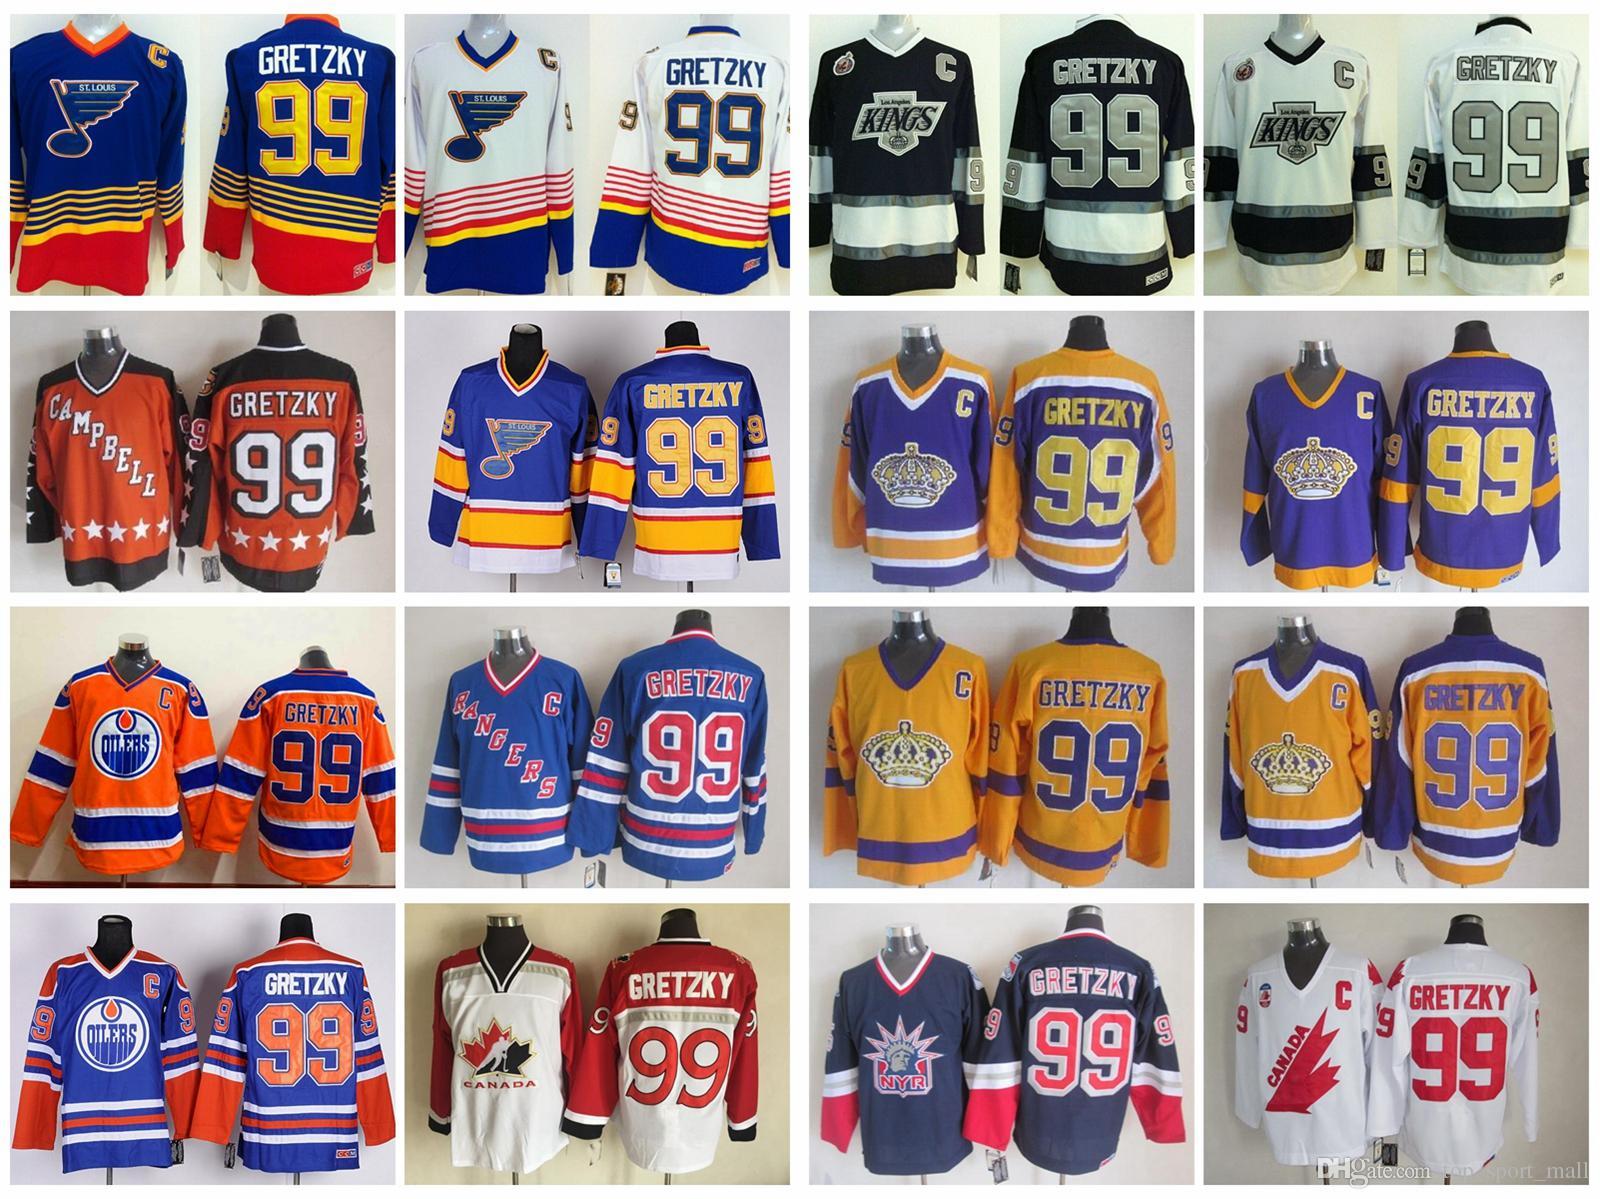 edd1765d ... Hockey Uniforms 2017 Throwback 99 Wayne Gretzky Jersey Men Stitched  Logo 1984 All Star New York Rangers La .